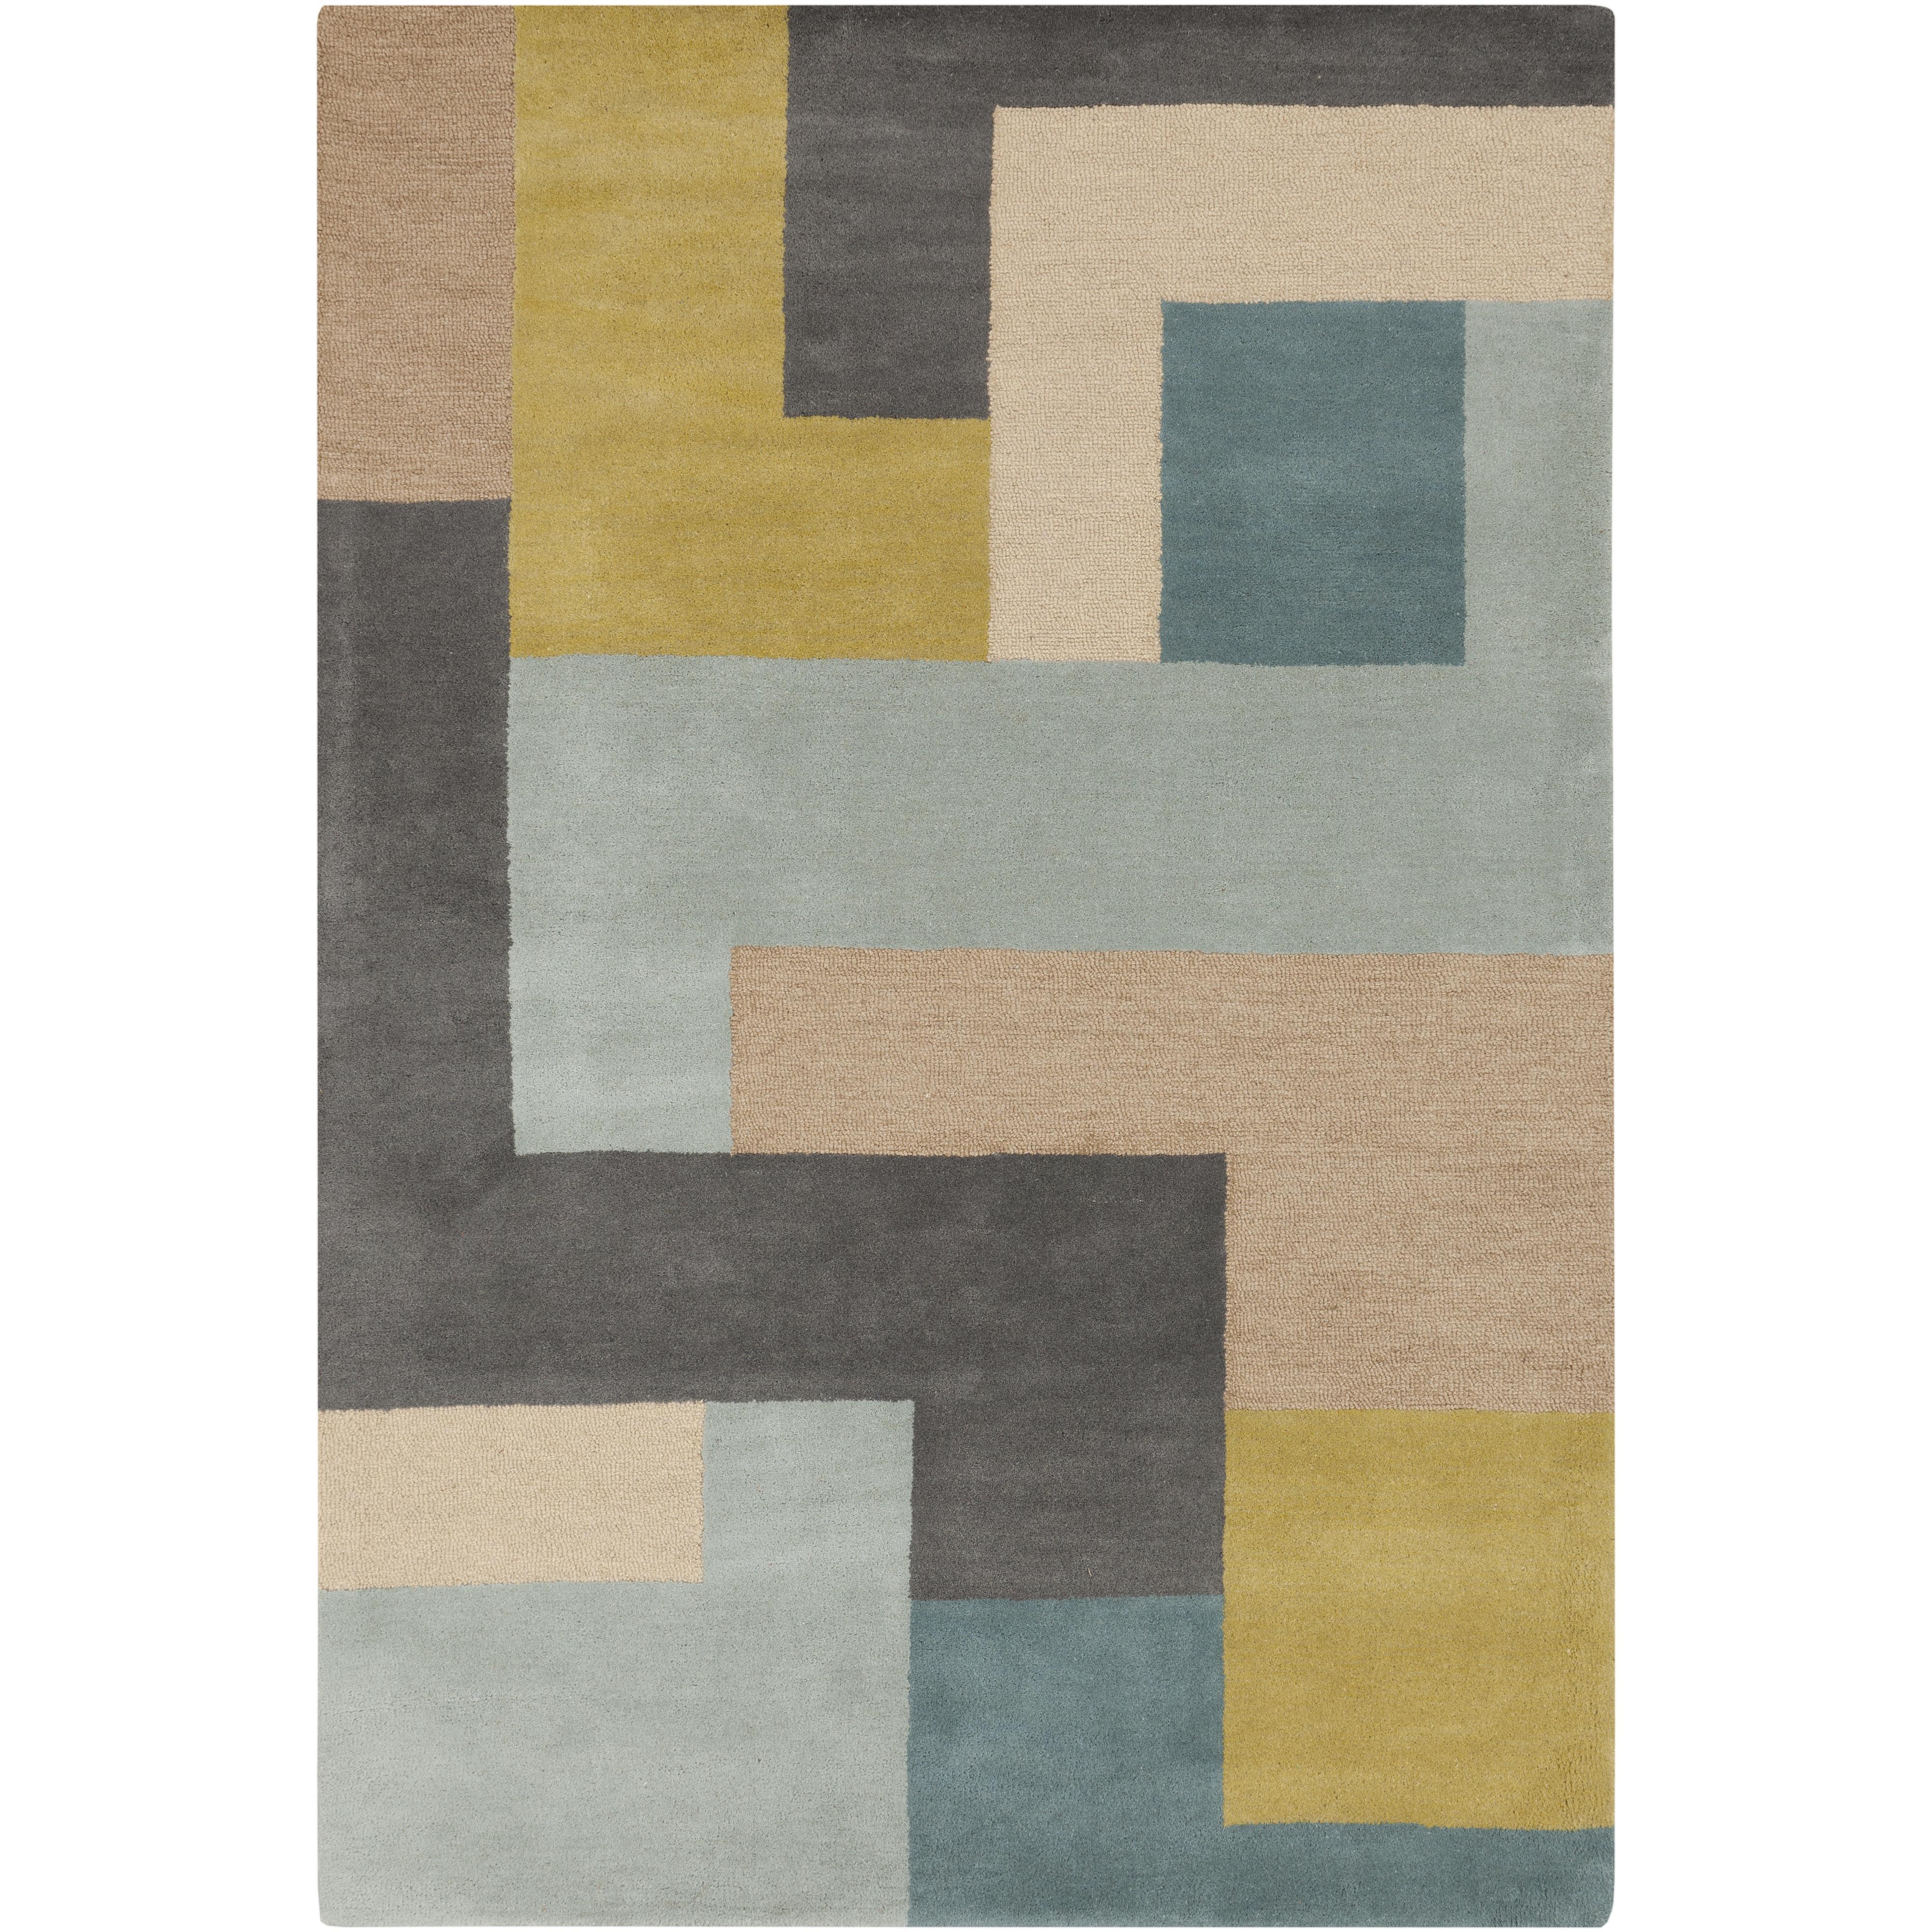 Surya Rugs Centennial 5' x 8' - Item Number: CNT1080-58